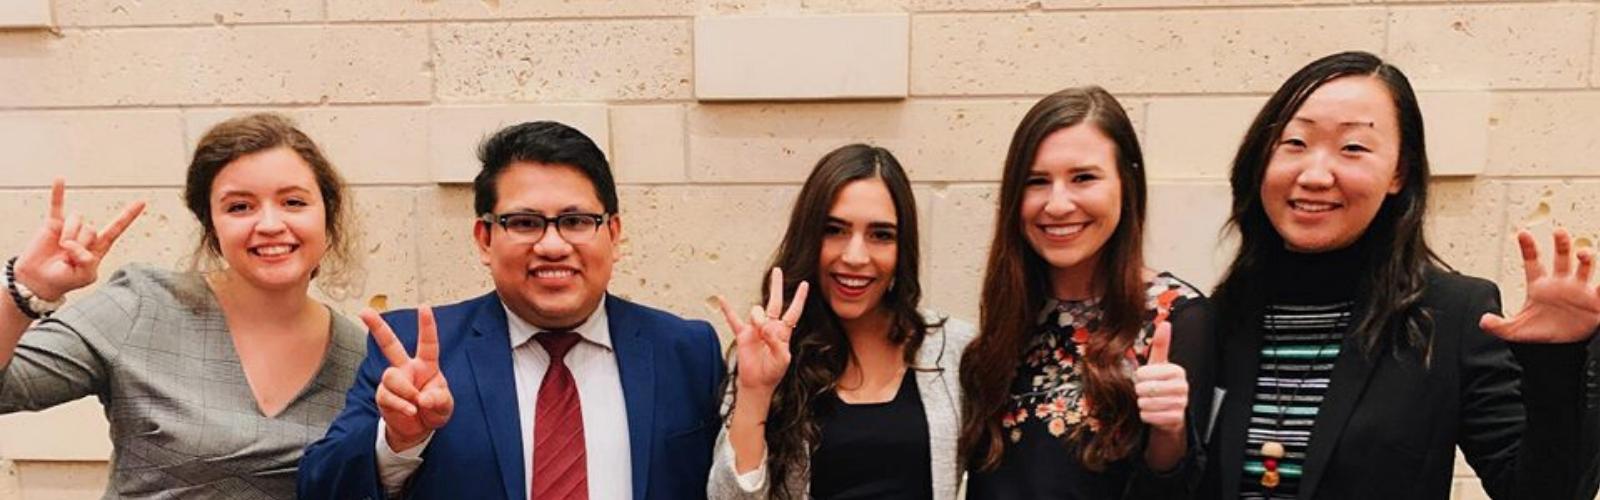 Photo of students serving as Texas Civic Ambassadors